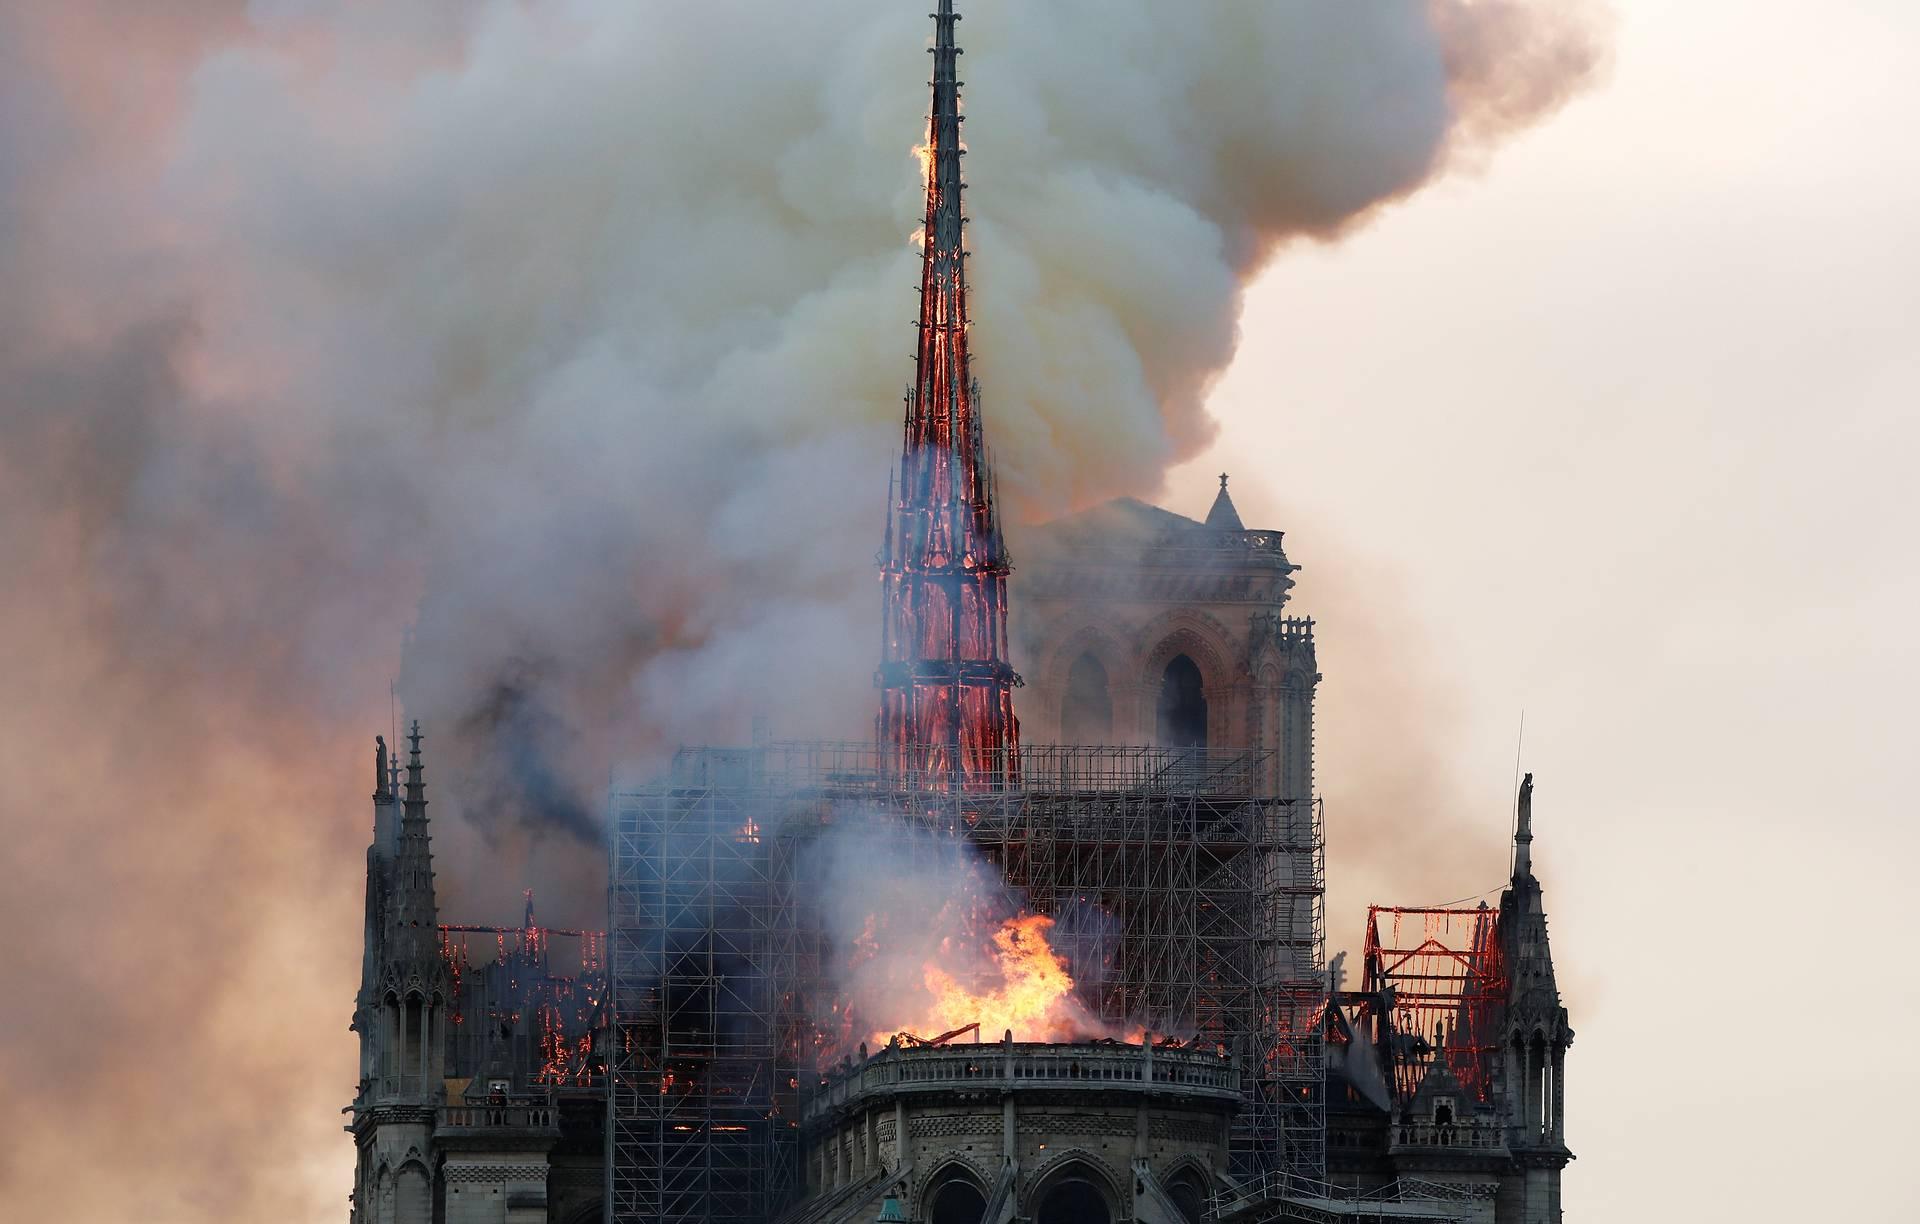 Нотр-Дам де Пари, Собор Парижской Богоматери, пожар